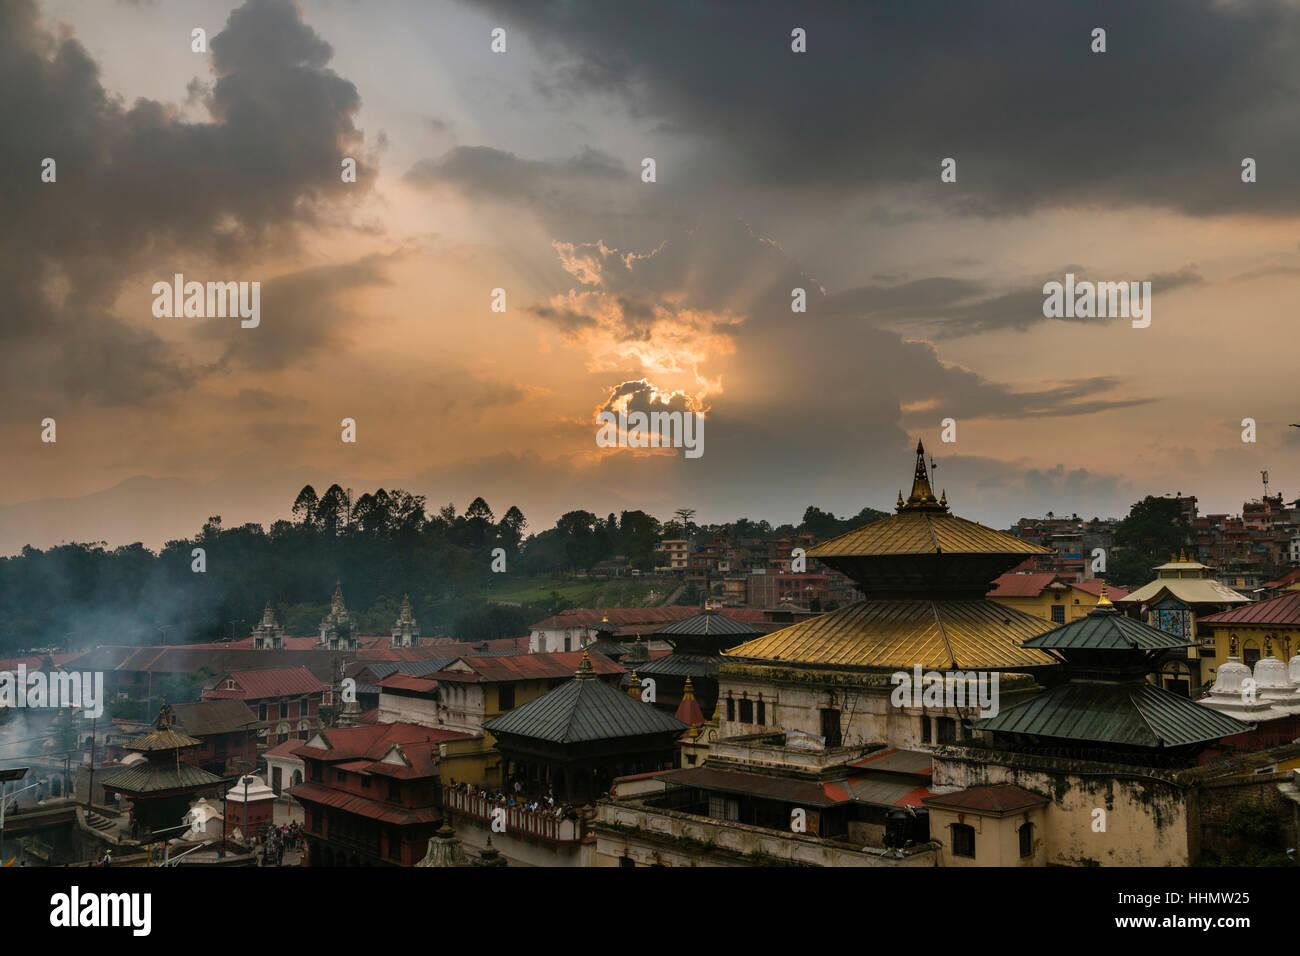 Sunset over the buildings of Pashupatinath temple, the banks of Bagmati River, Kathmandu, Kathmandu District, Nepal - Stock Image